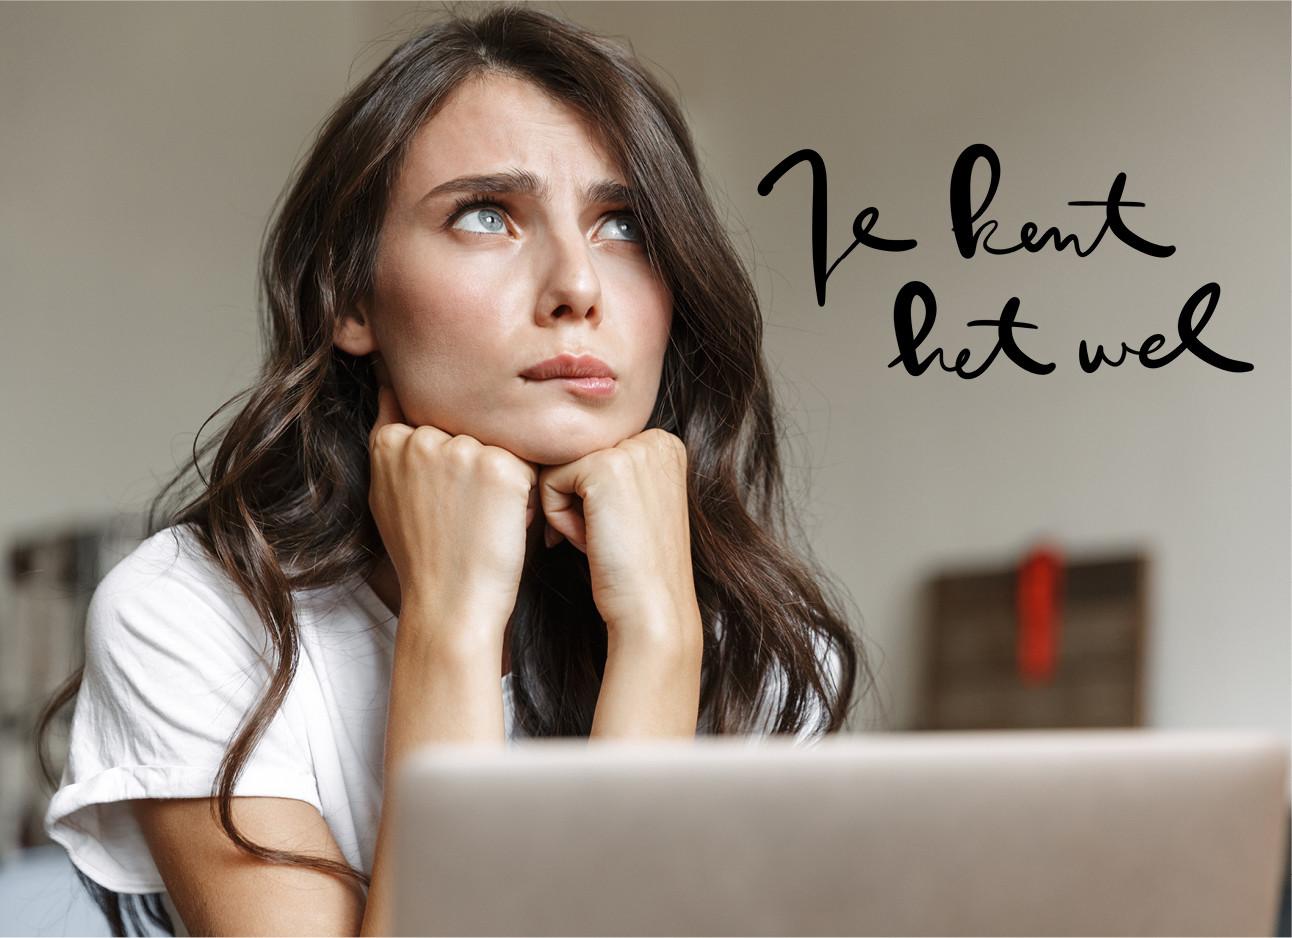 vrouw nerveus achter laptop